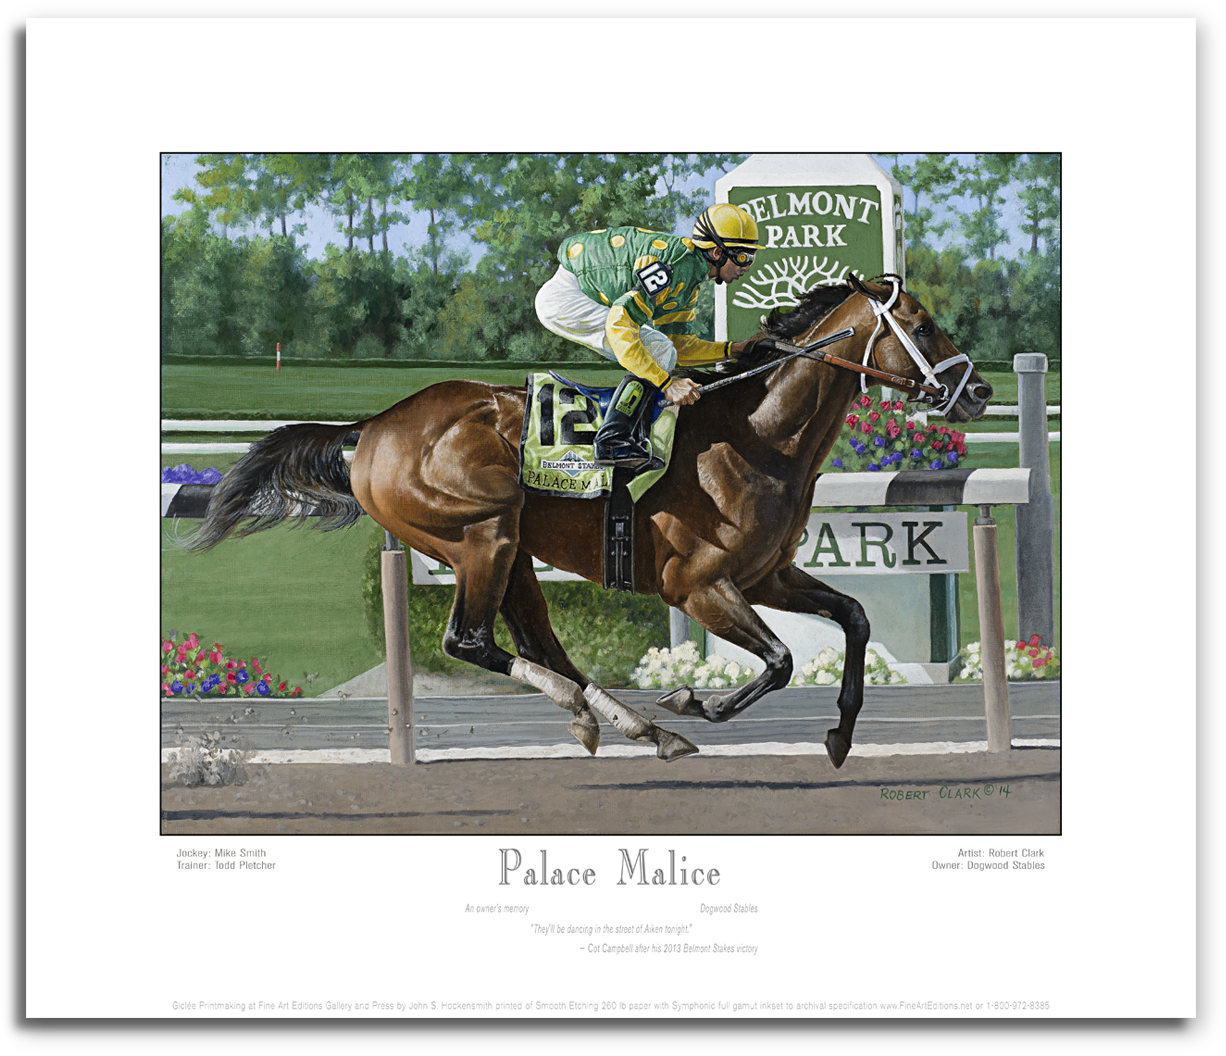 Fine Art Editions   Palace Malice by Robert Clark – Print